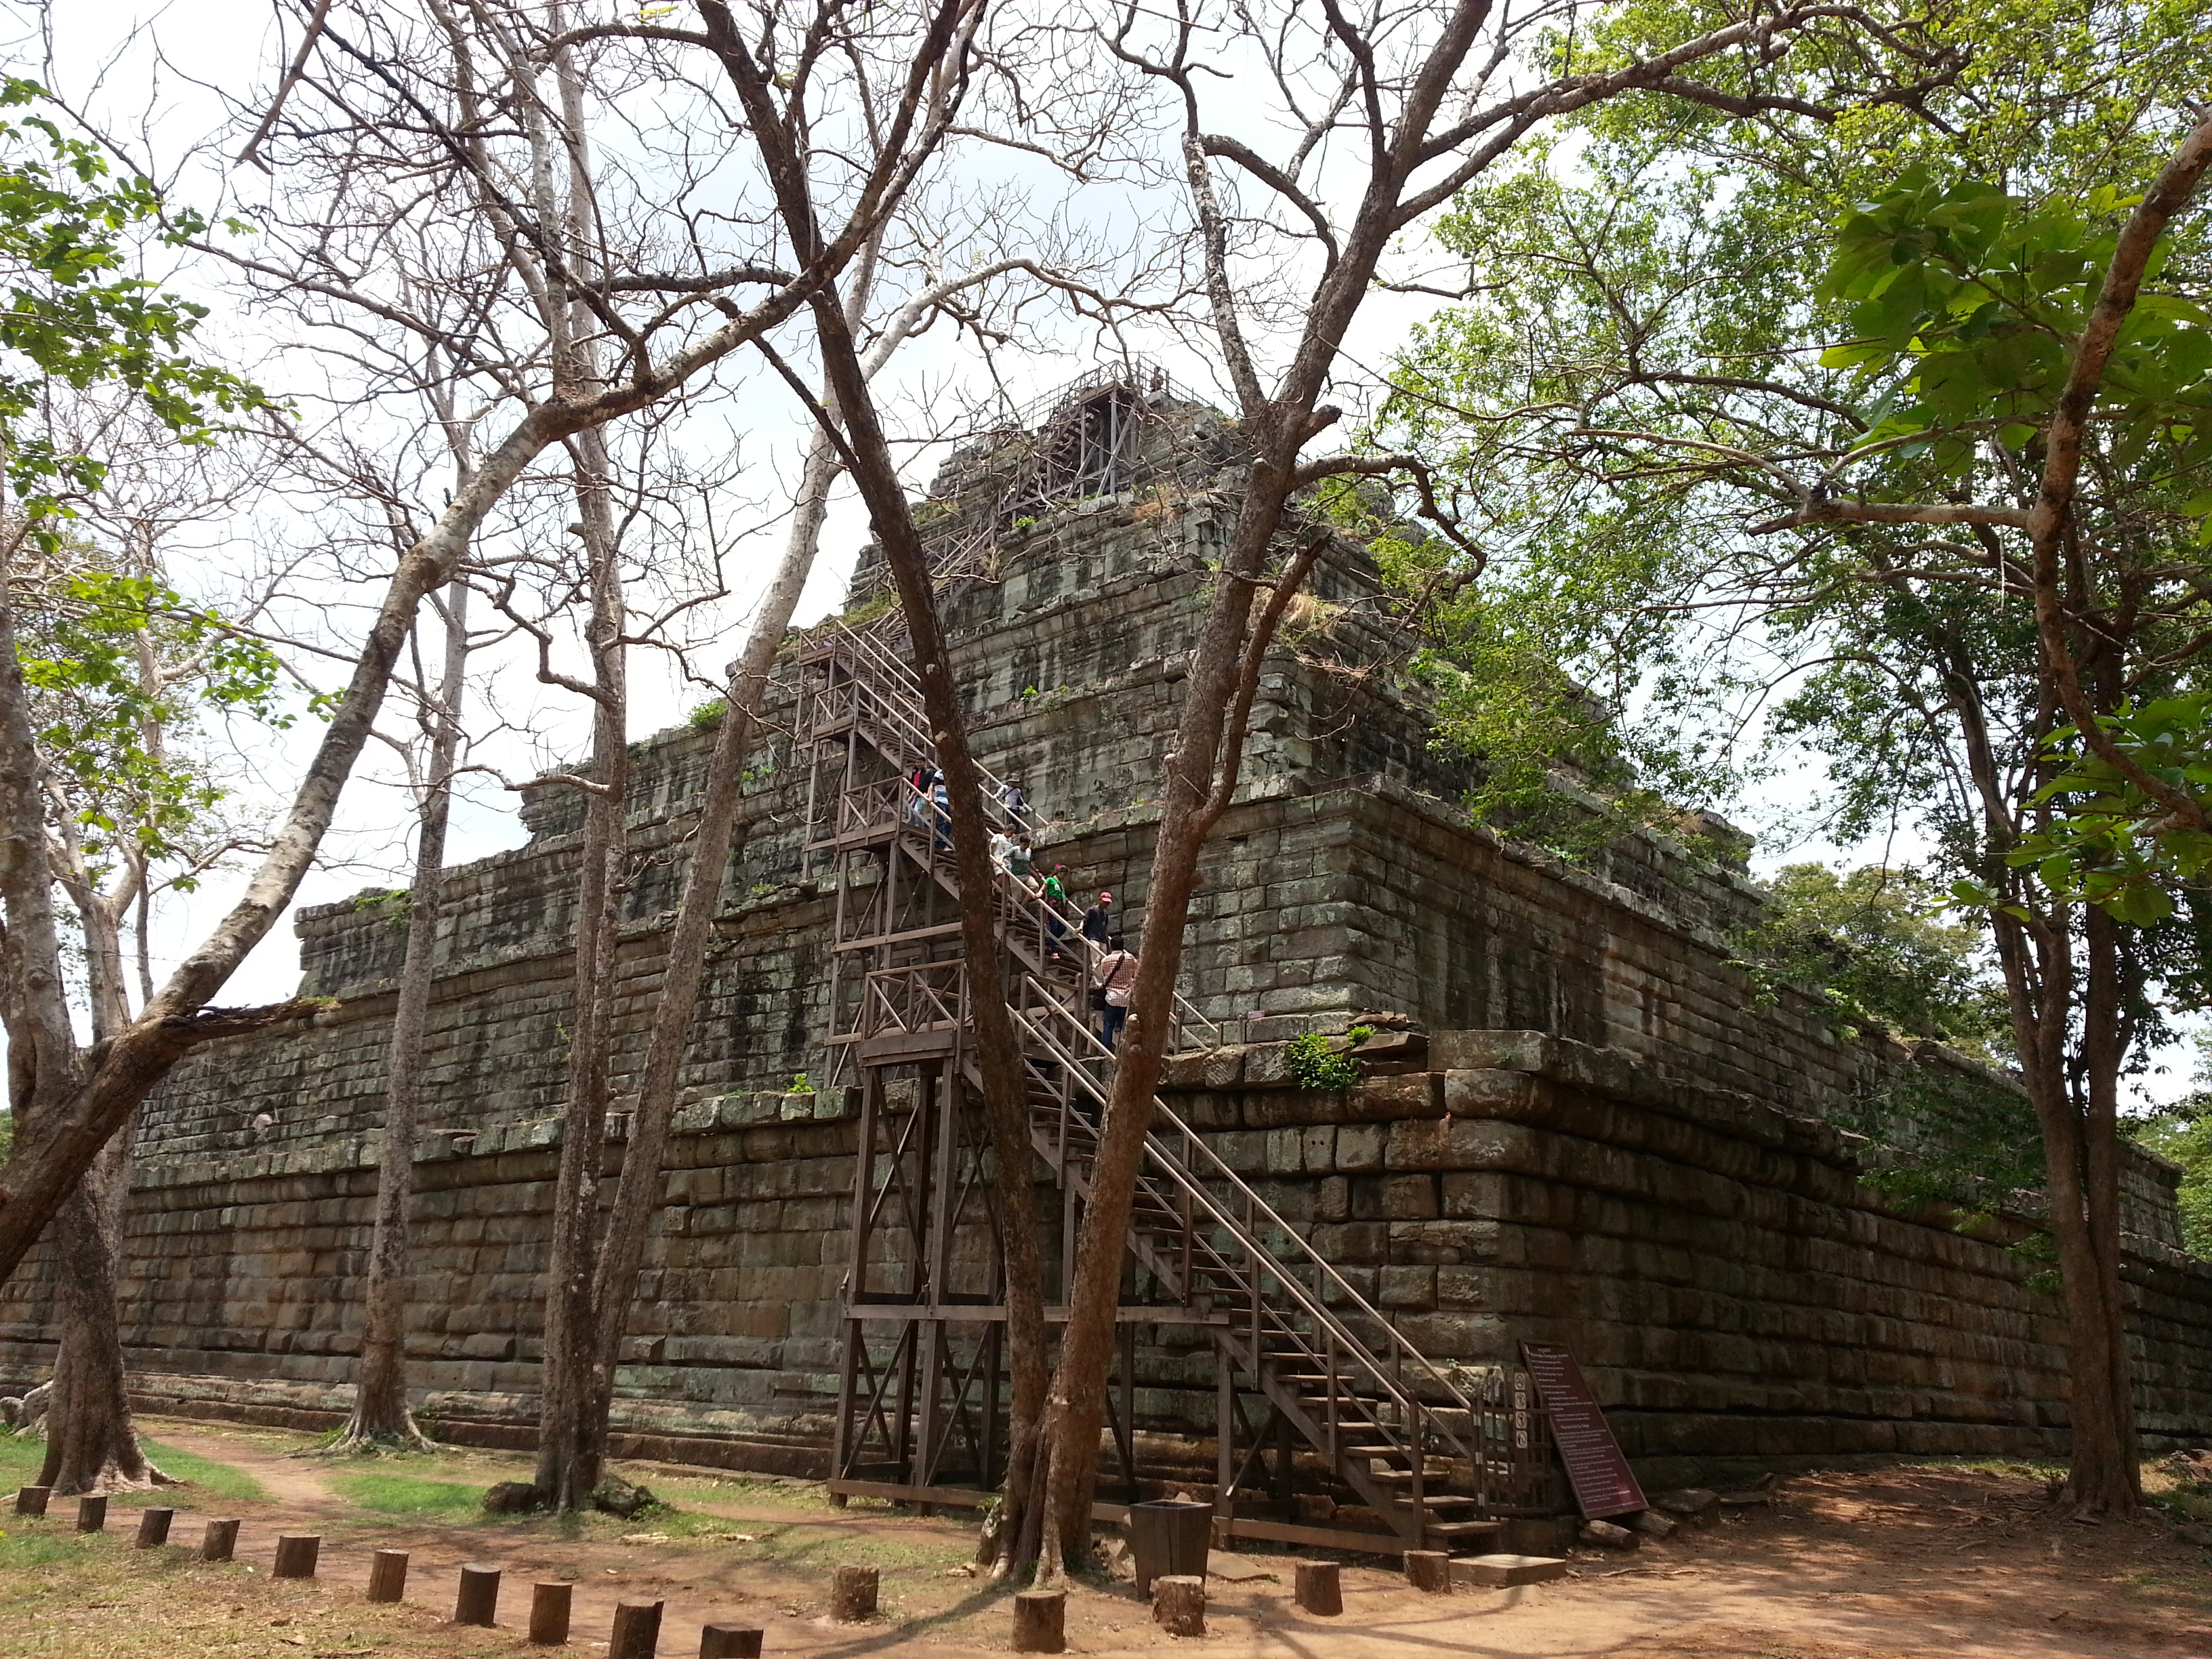 Pyramid Temple, Koh Keh Group